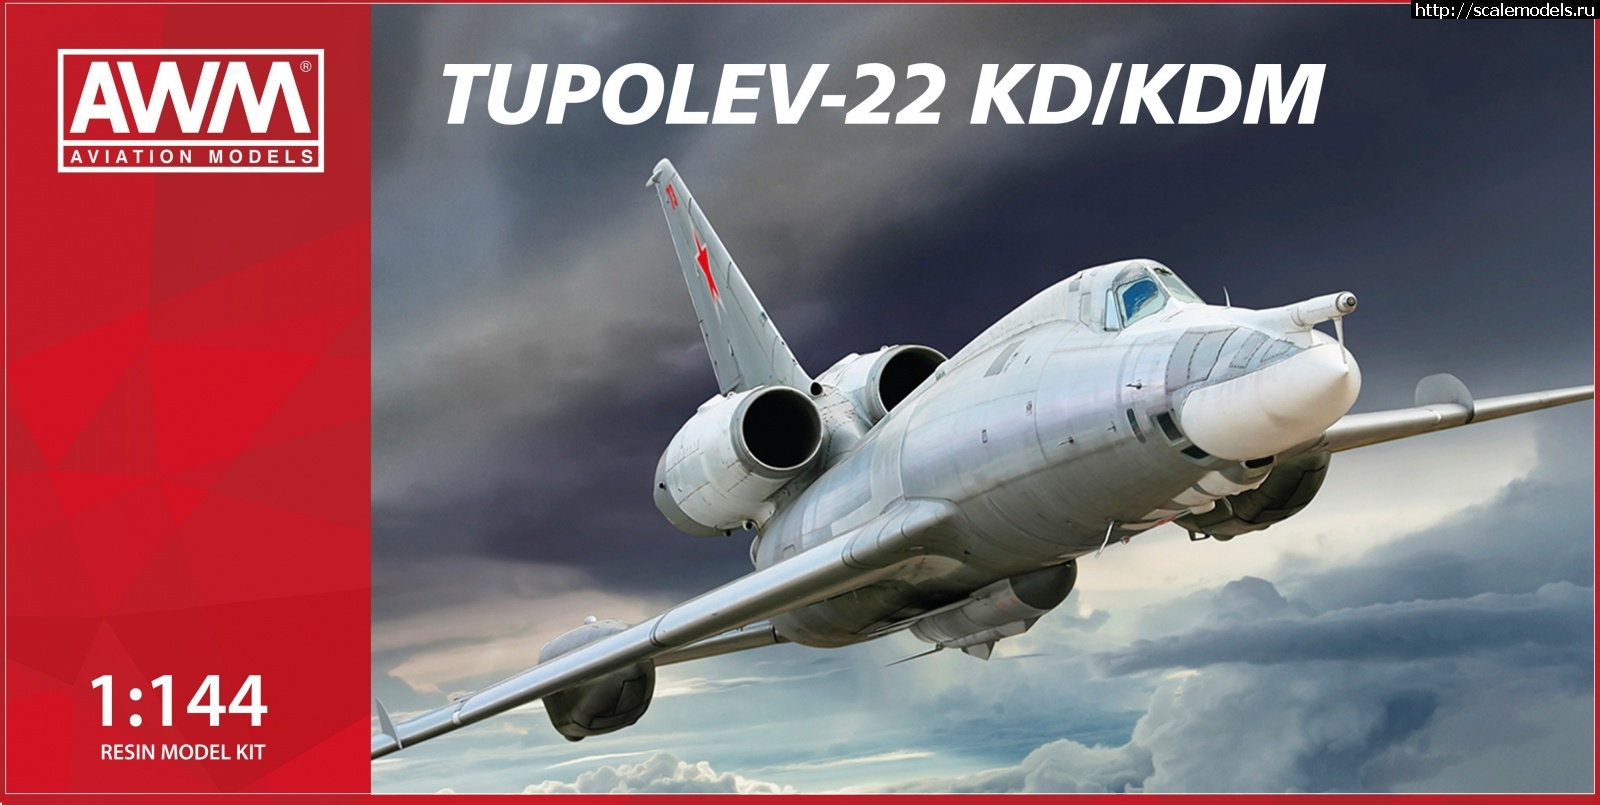 Ту-22УД и Ту-22КД(М) 1/144 AWM Закрыть окно